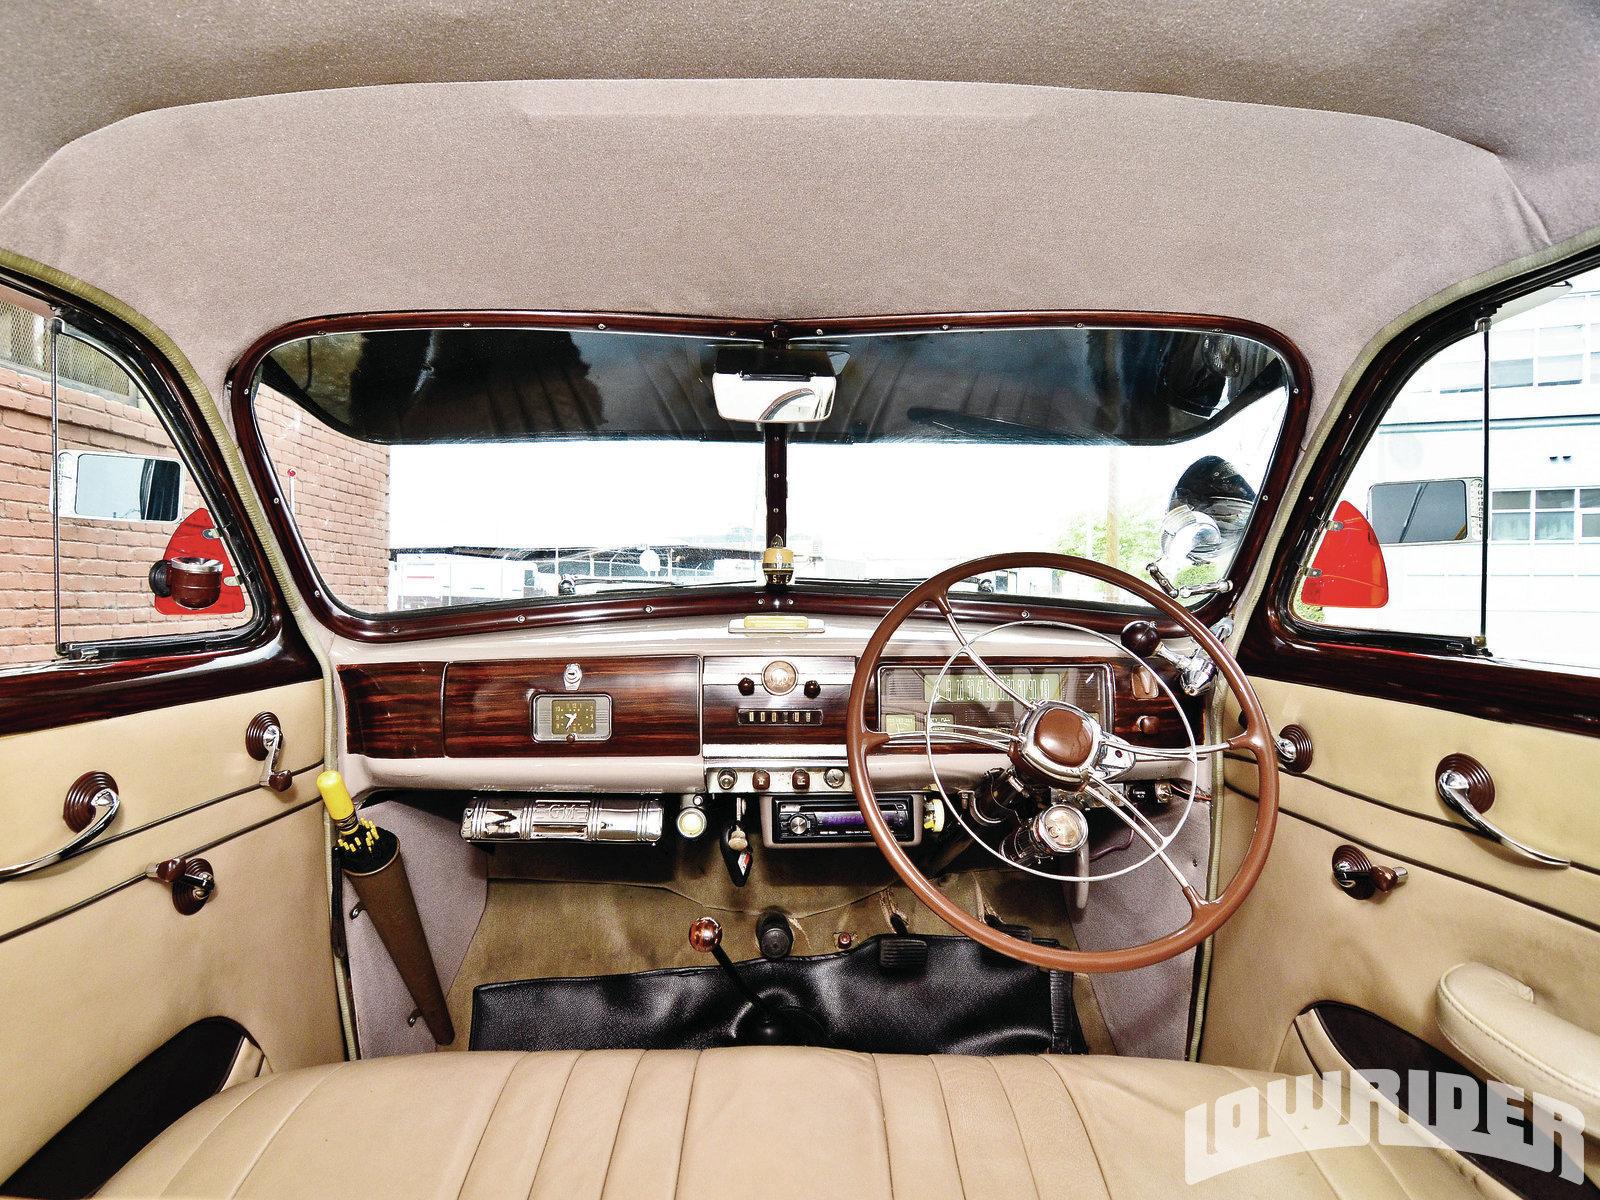 1939 Right-Hand Drive Chevrolet Sedan - Lowrider Magazine